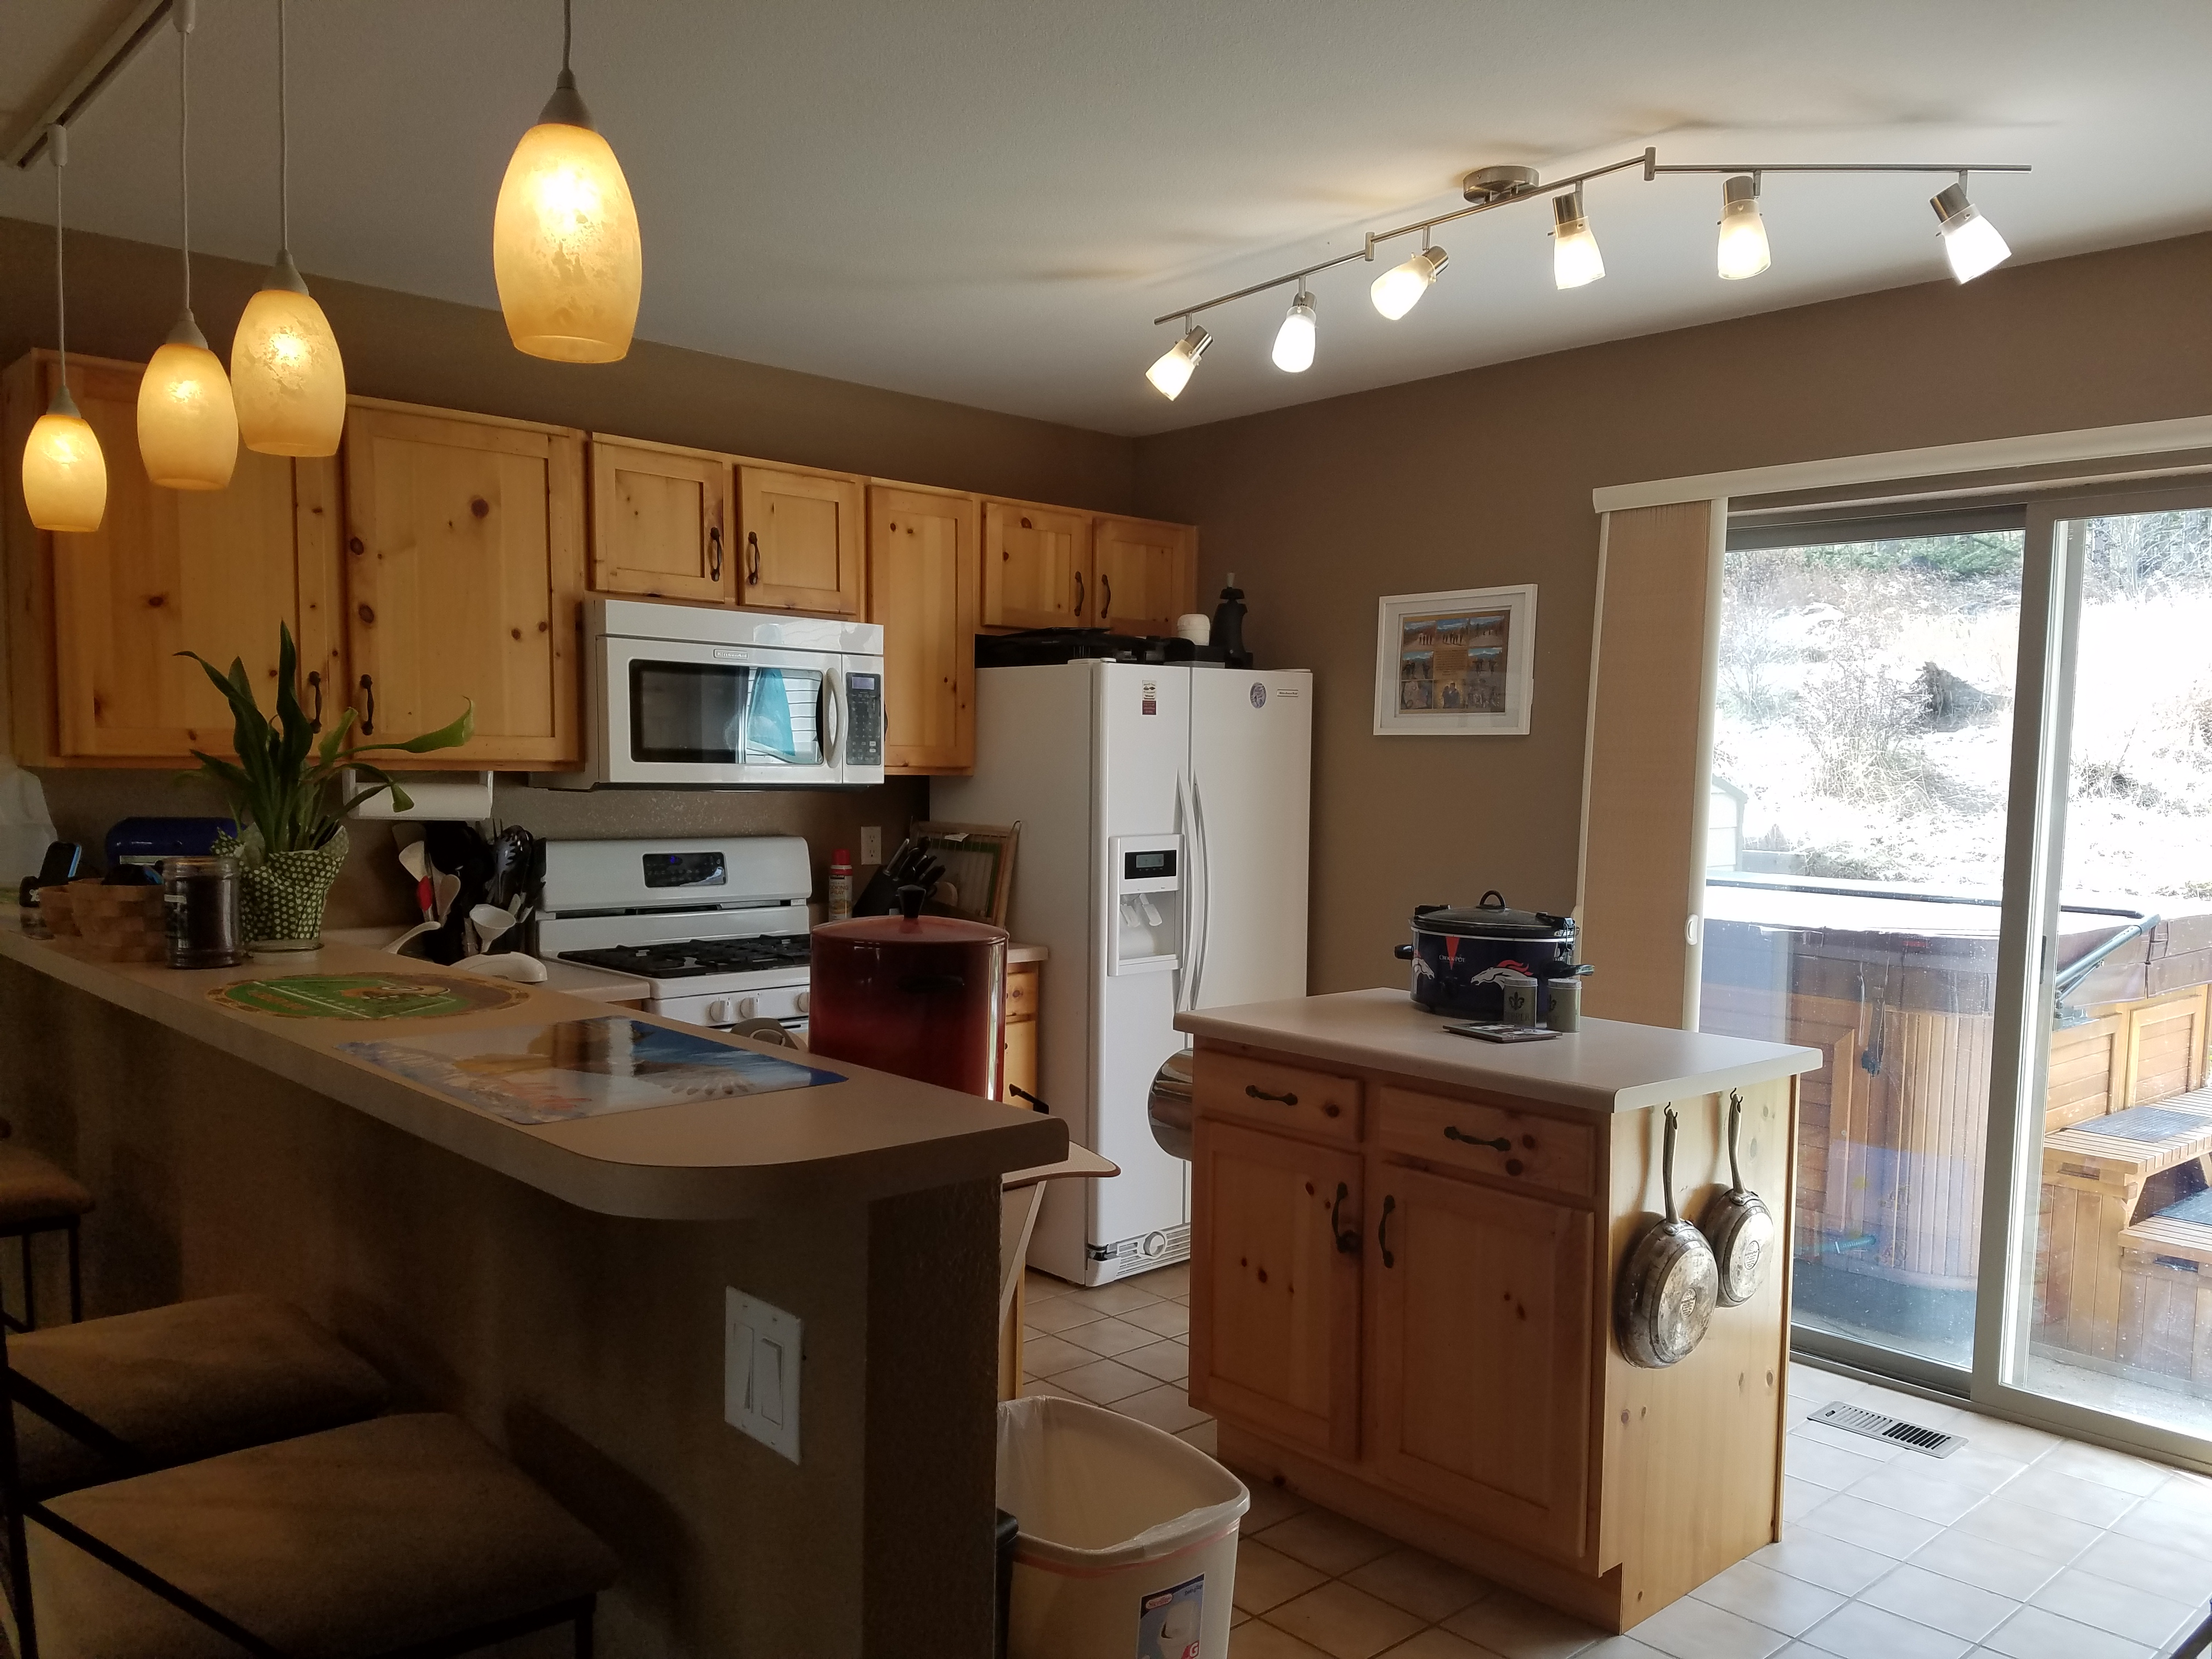 Casa unifamiliar adosada (Townhouse) por un Venta en Fantastic Home on Raven Golf Course 203 Krestrel Lane Silverthorne, Colorado 80498 Estados Unidos